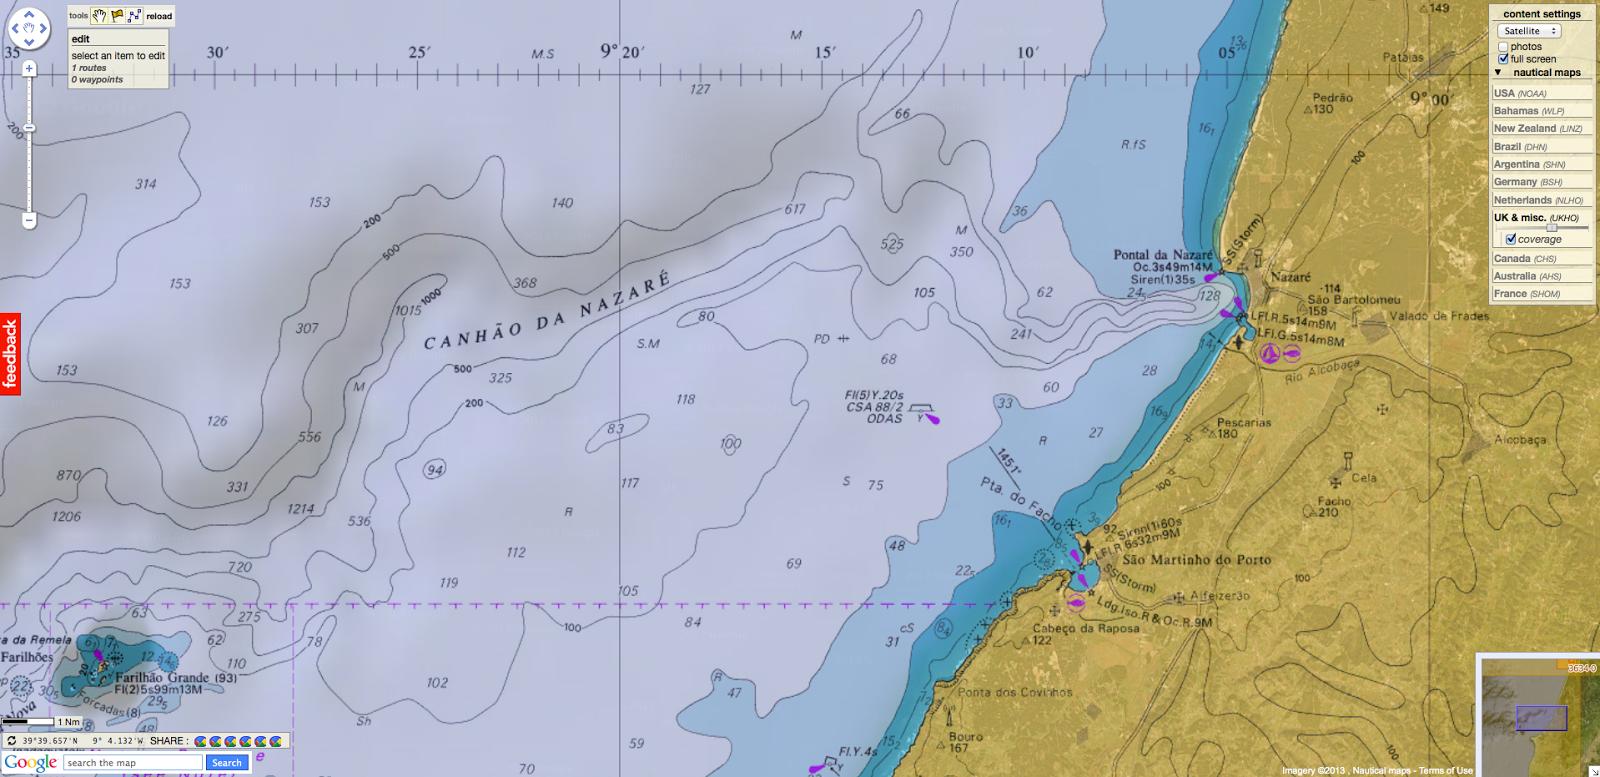 Nazaré et son canyon, et la petite baie de Sao Martinho juste au sud. Carte Marine GeoGarage.